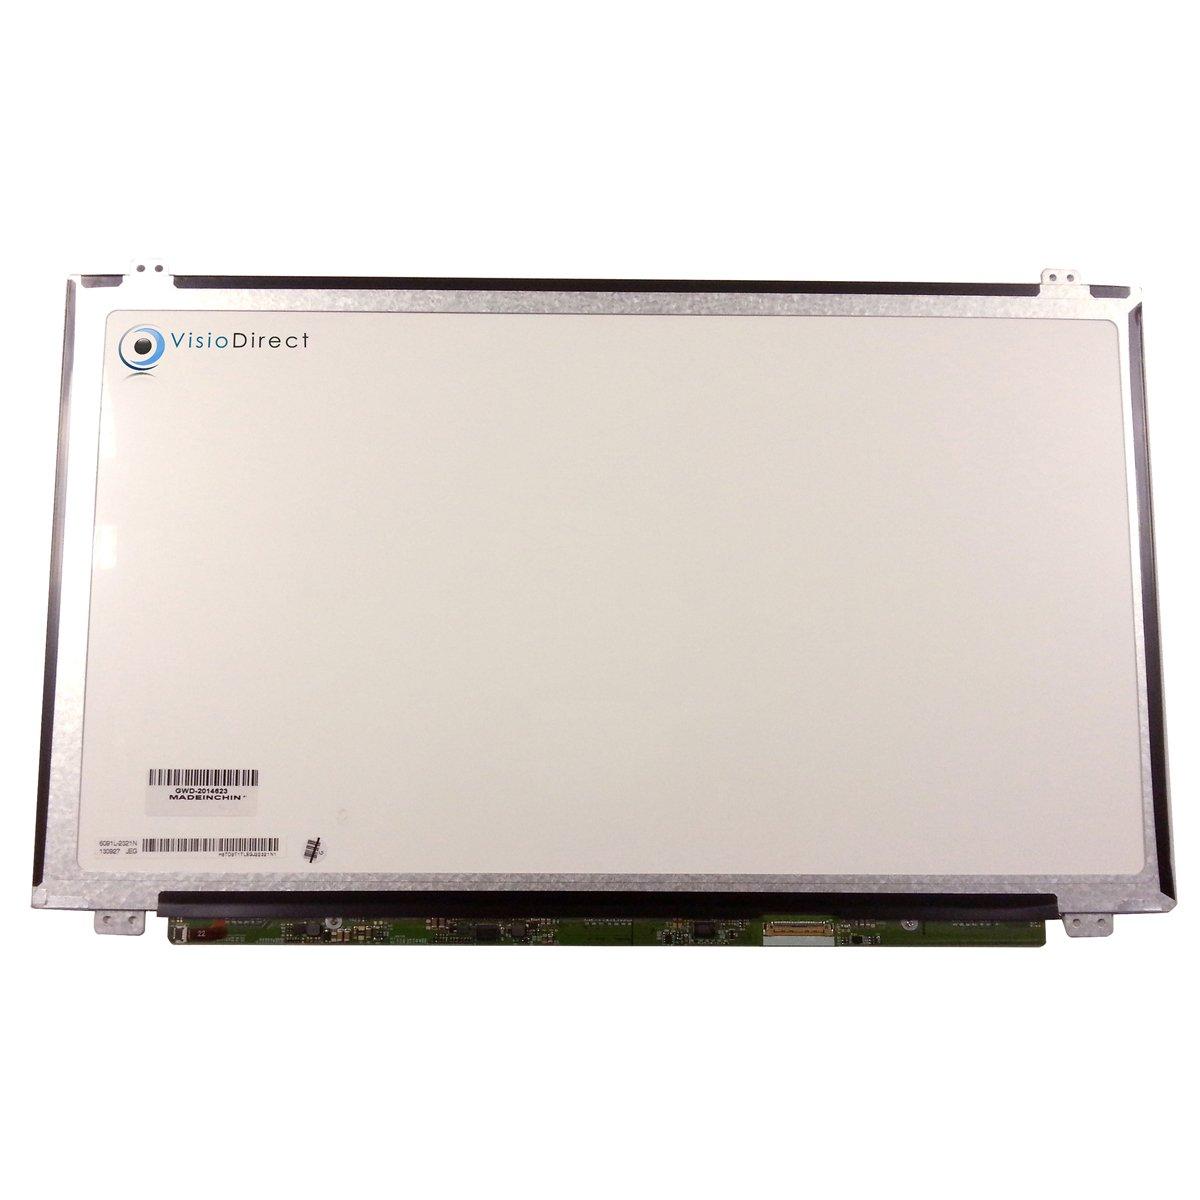 VISIODIRECT Bildschirm LCD Display 15.6LED typ LP156WF6 SPB1 SPD1 SPB2 SP B1 D1 B2 1920x1080 30 pin